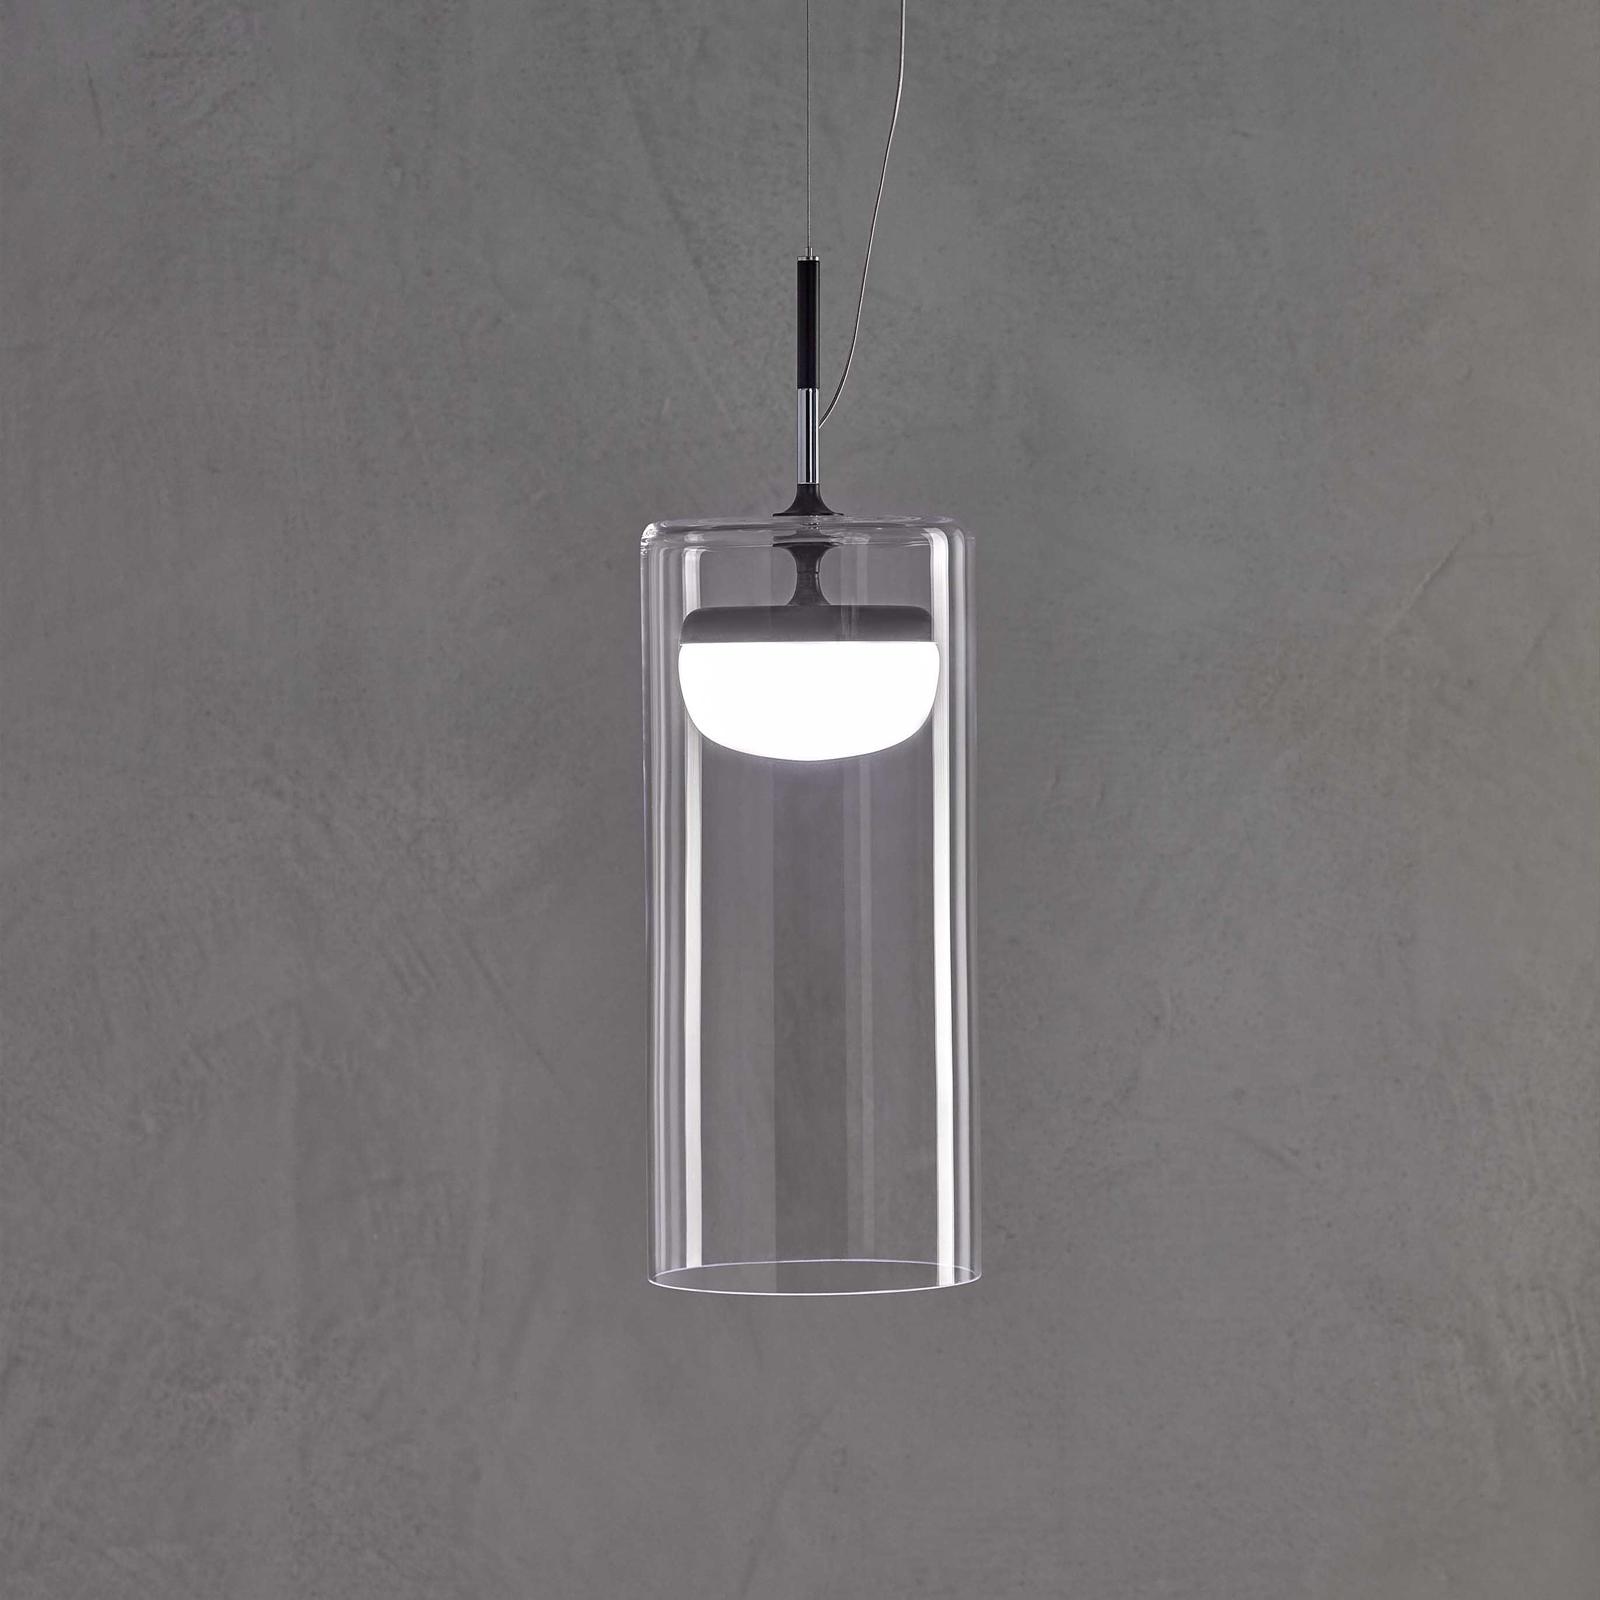 Prandina Diver LED-riippuvalaisin S5 musta